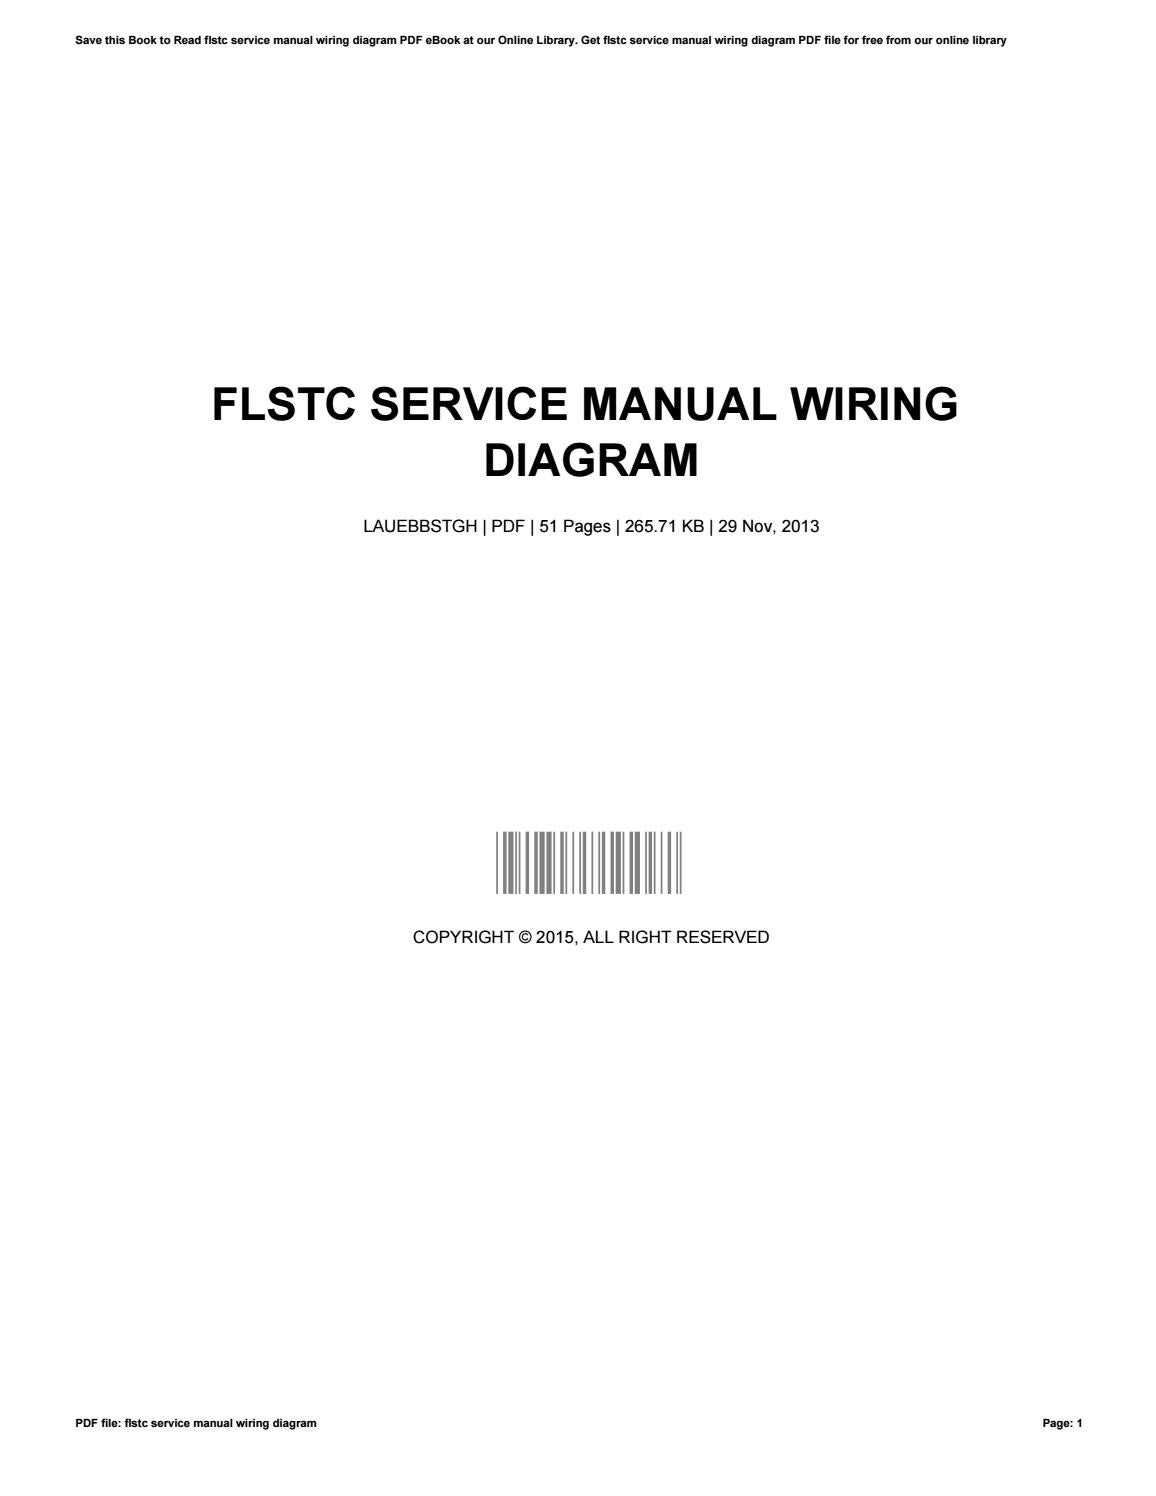 flstc service manual wiring diagram by i2595 - issuu  issuu